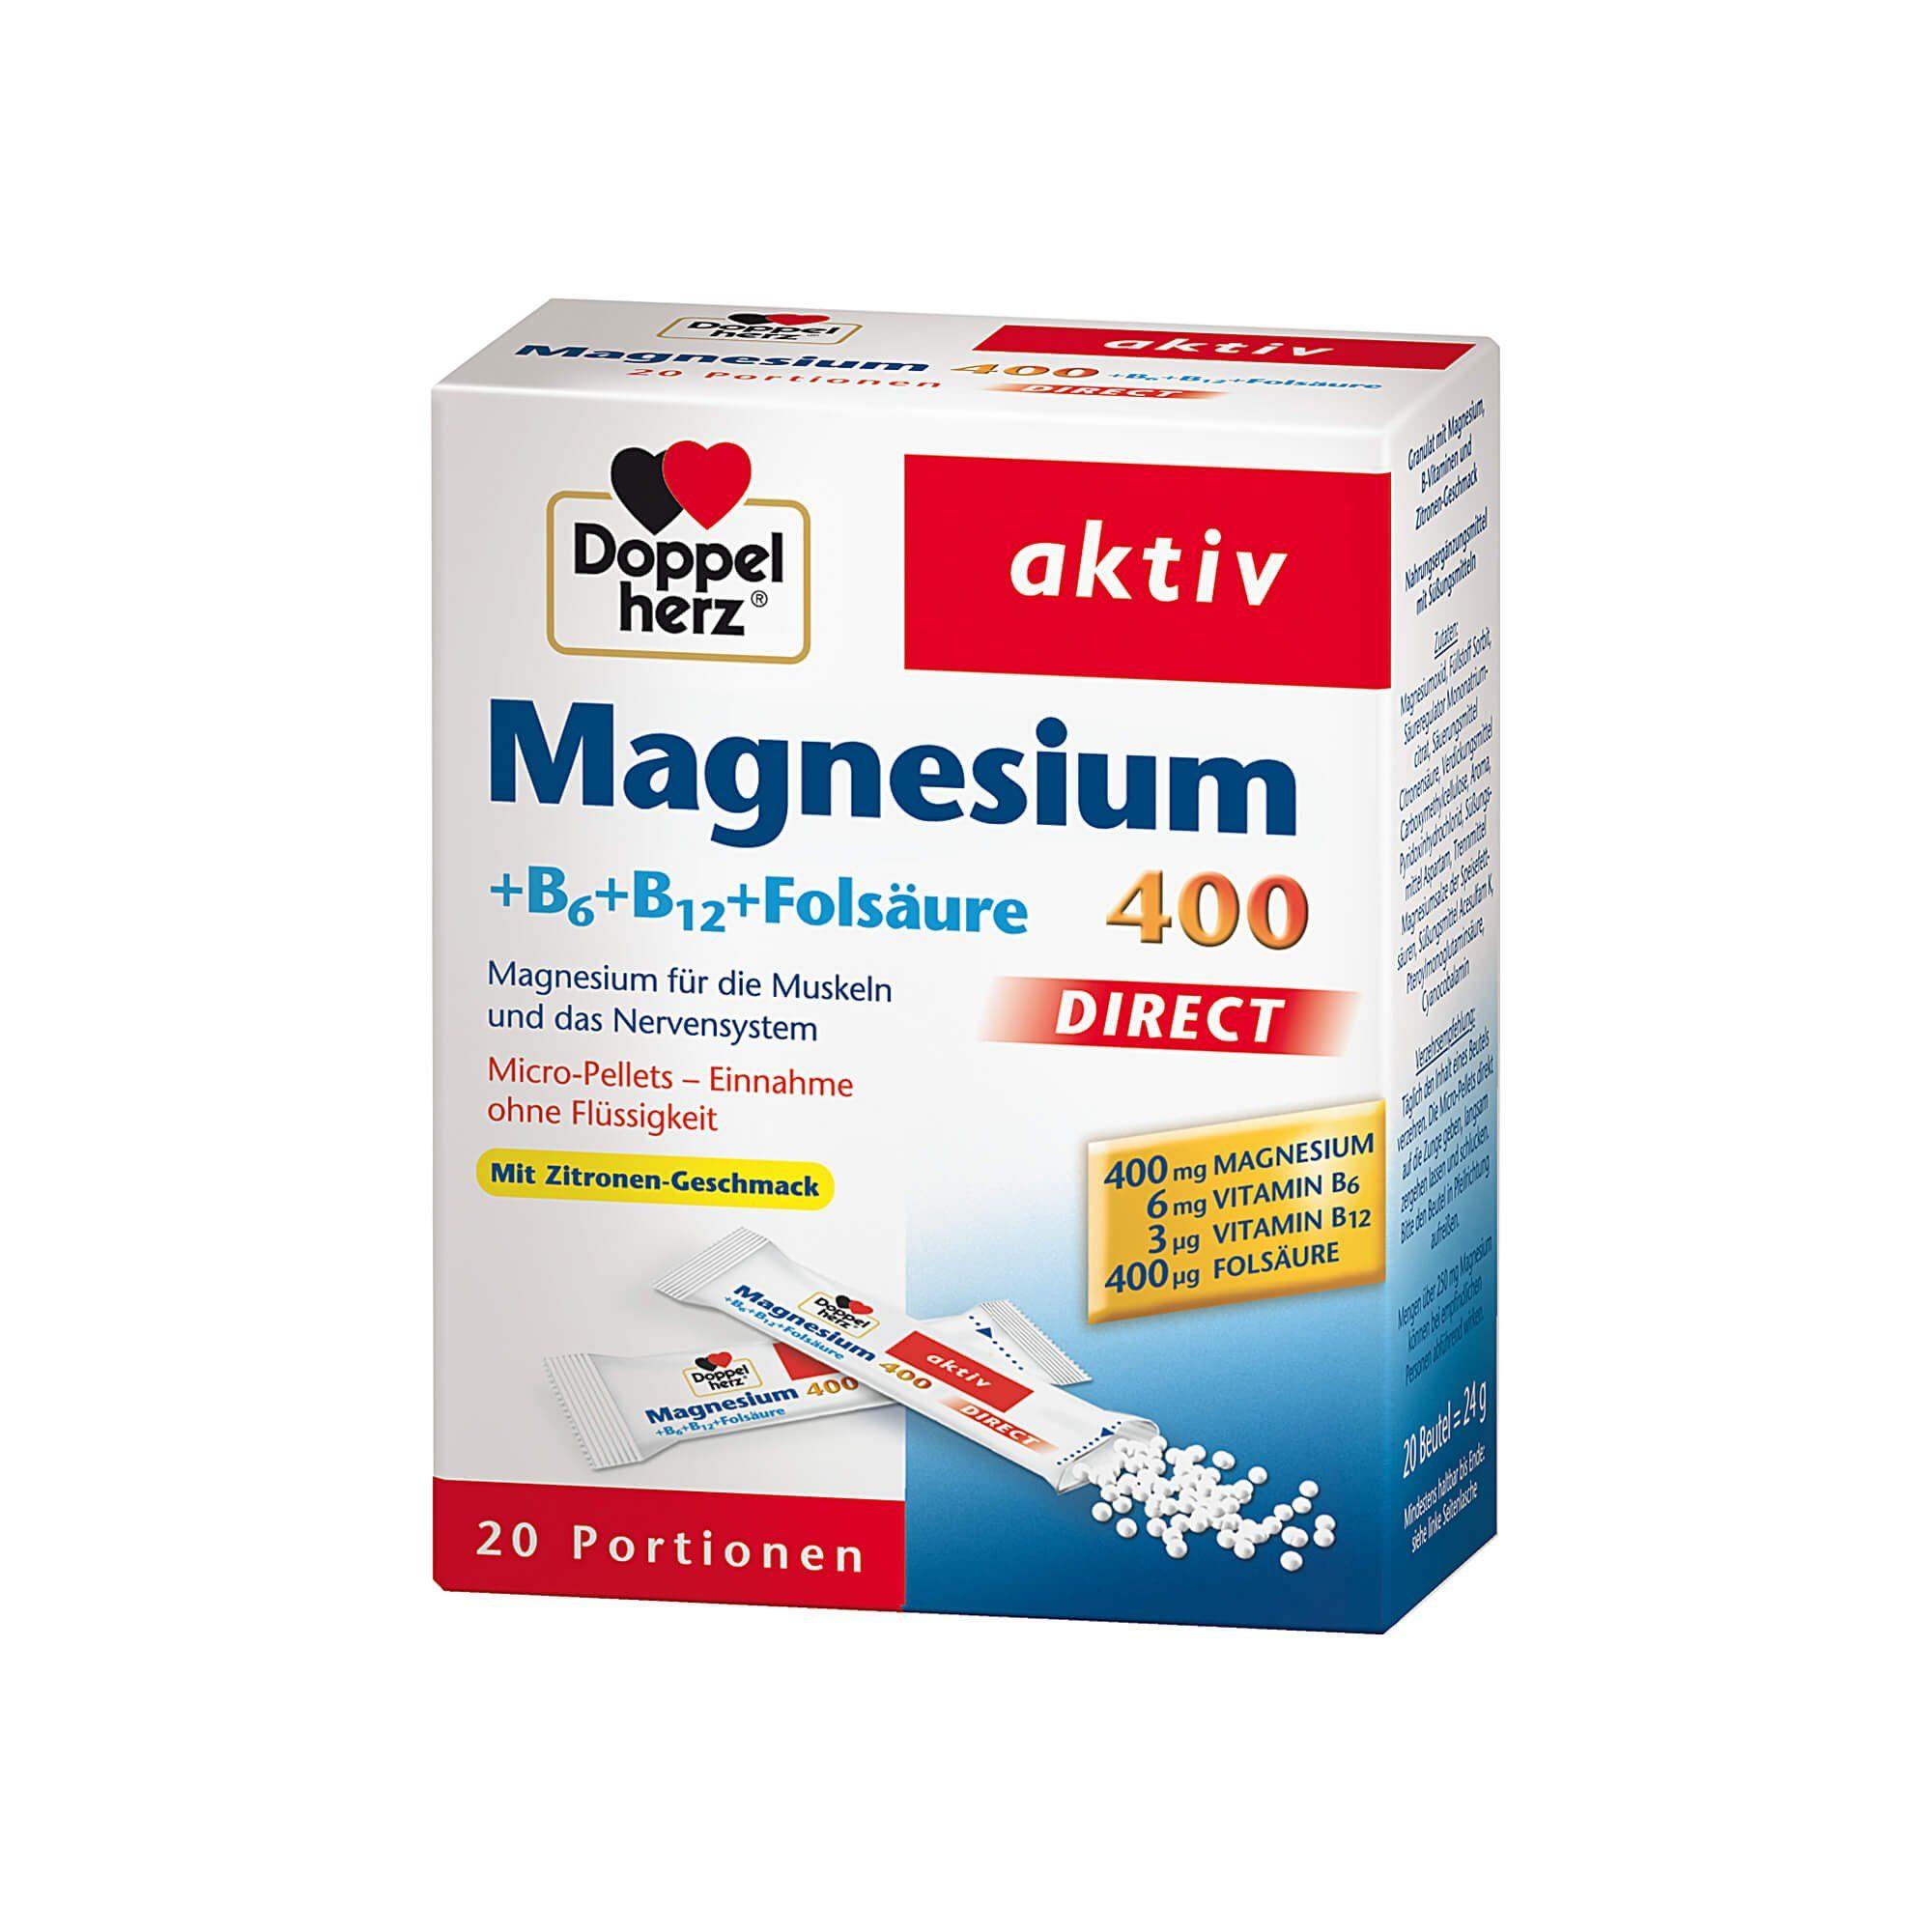 Doppelherz Magnesium + B6 + B12 + Folsäure 400 aktiv , 20 St